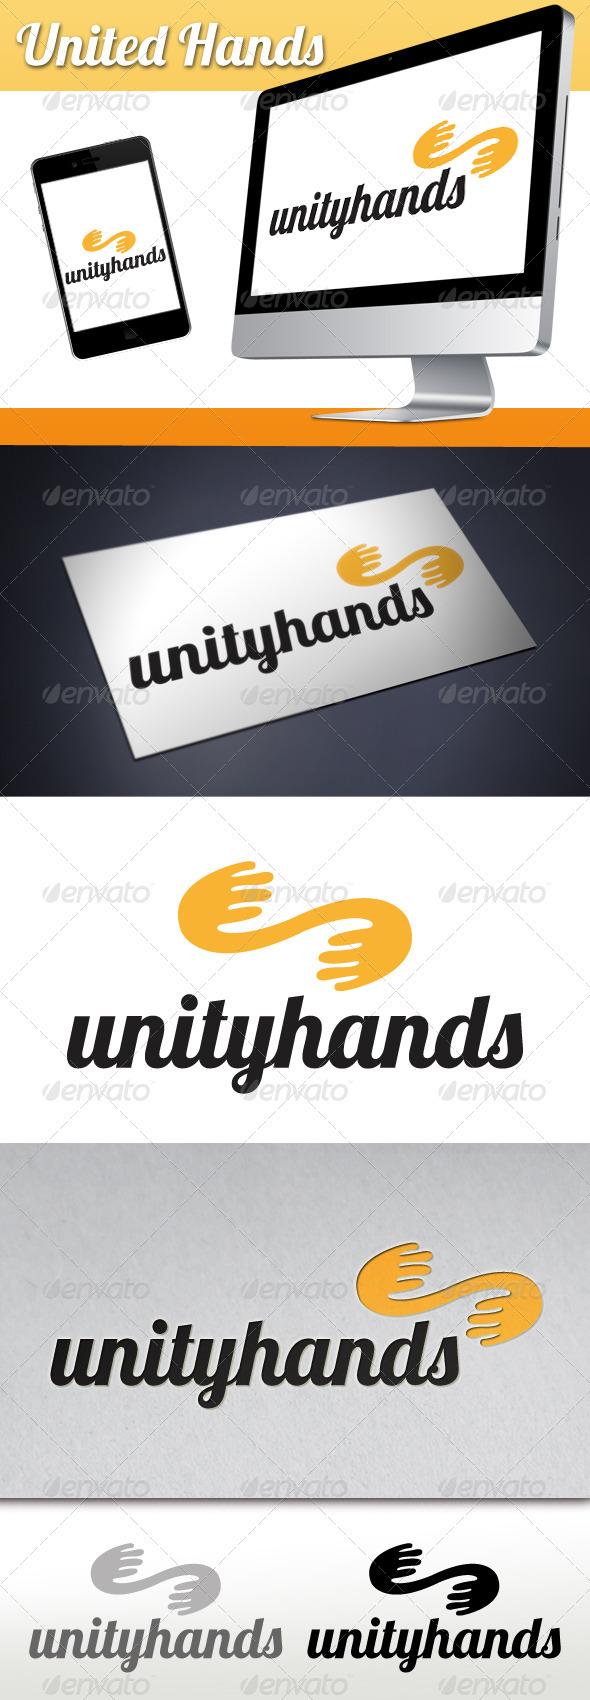 GraphicRiver United Hands Logo 3360800